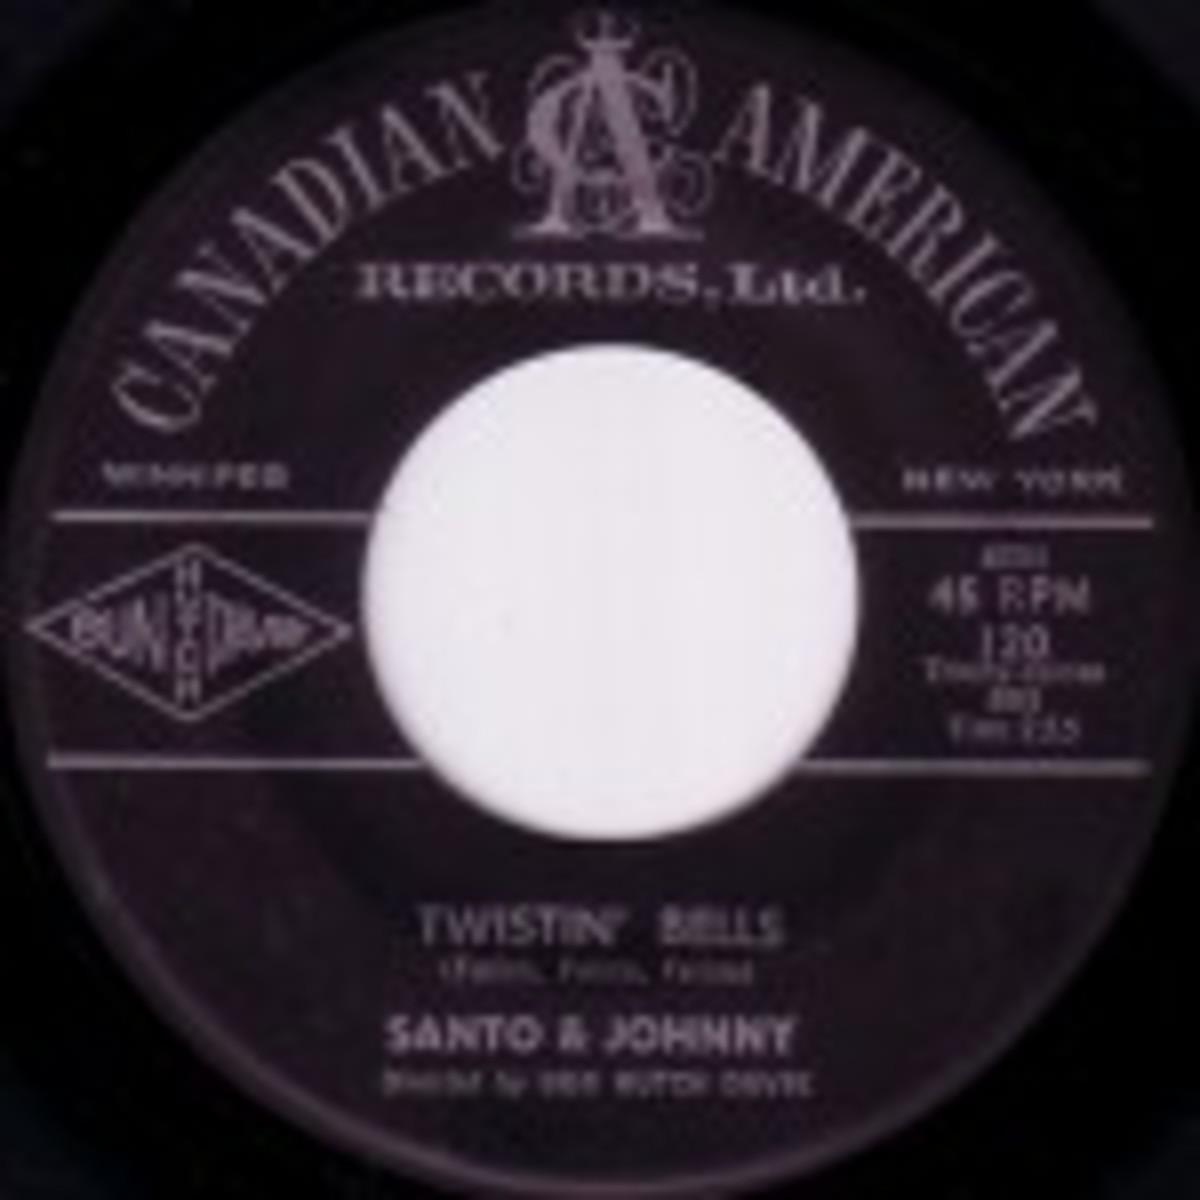 Twistin' Bells Santo and Johnny